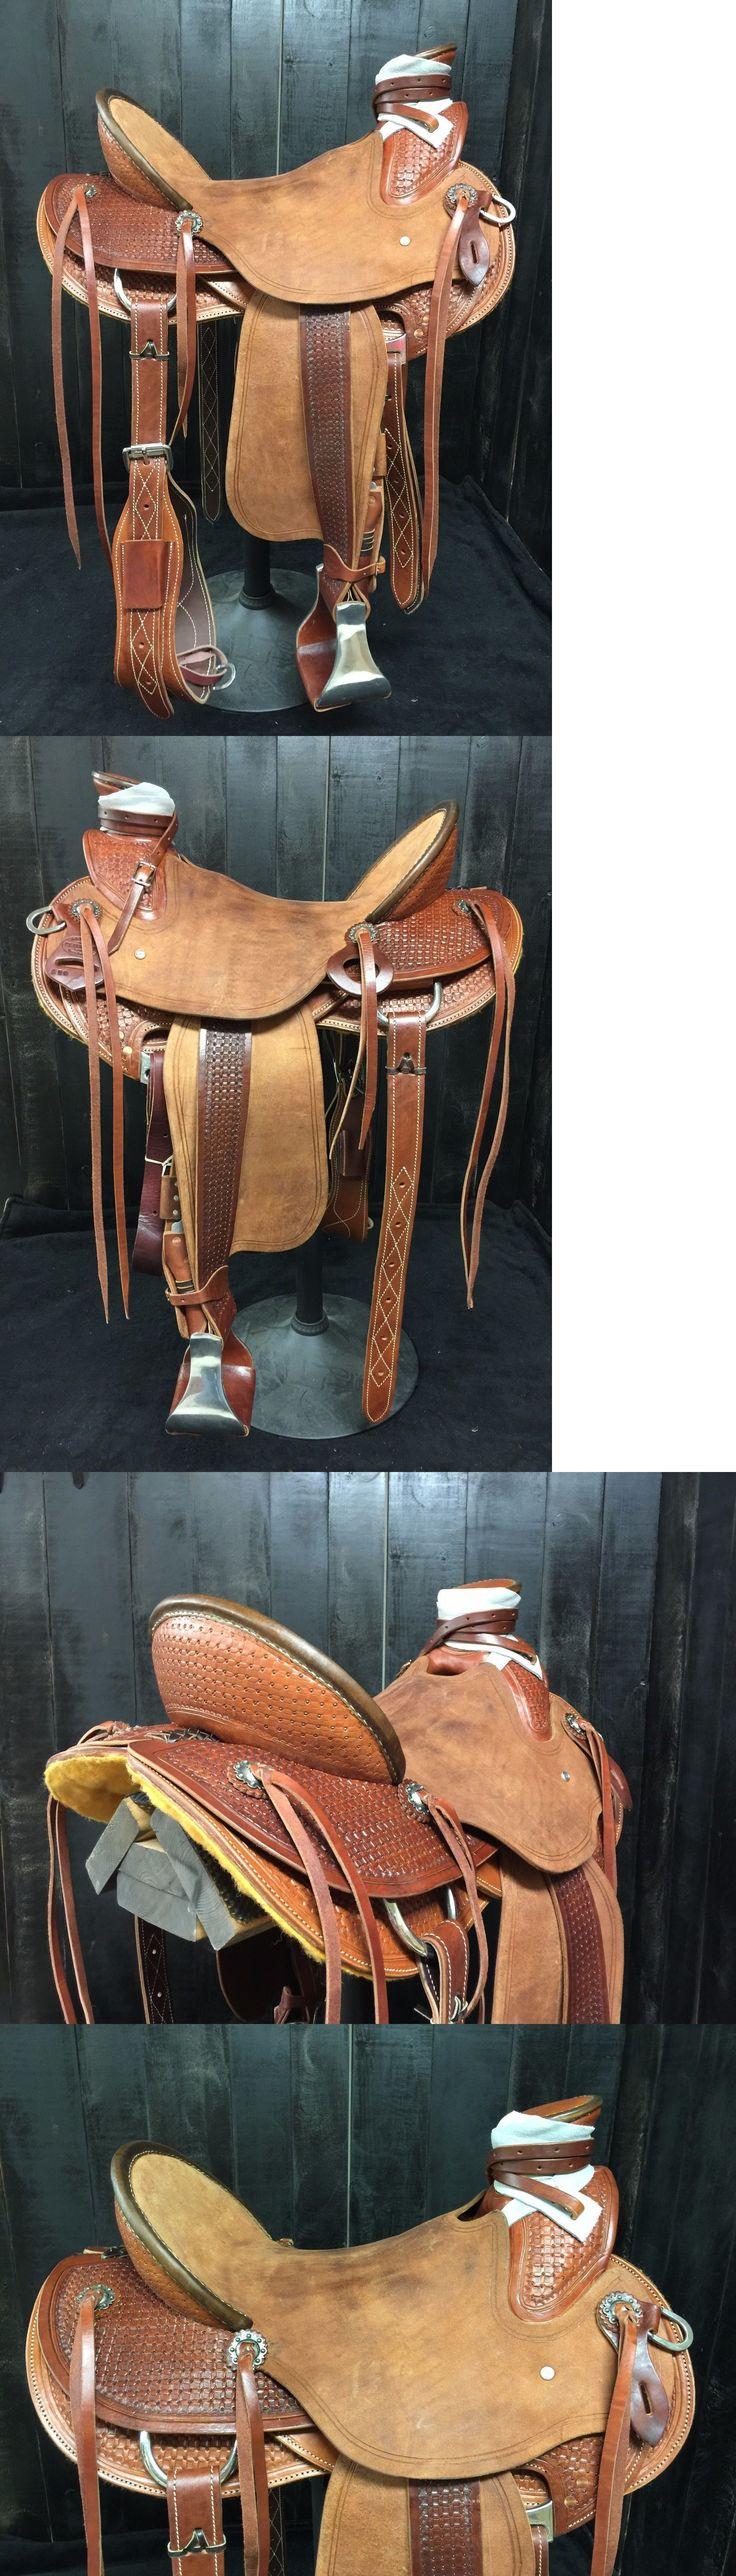 Saddles 47291: Custom Wade Saddle - Ranch Roping Training Trail Association -> BUY IT NOW ONLY: $1299.99 on eBay!